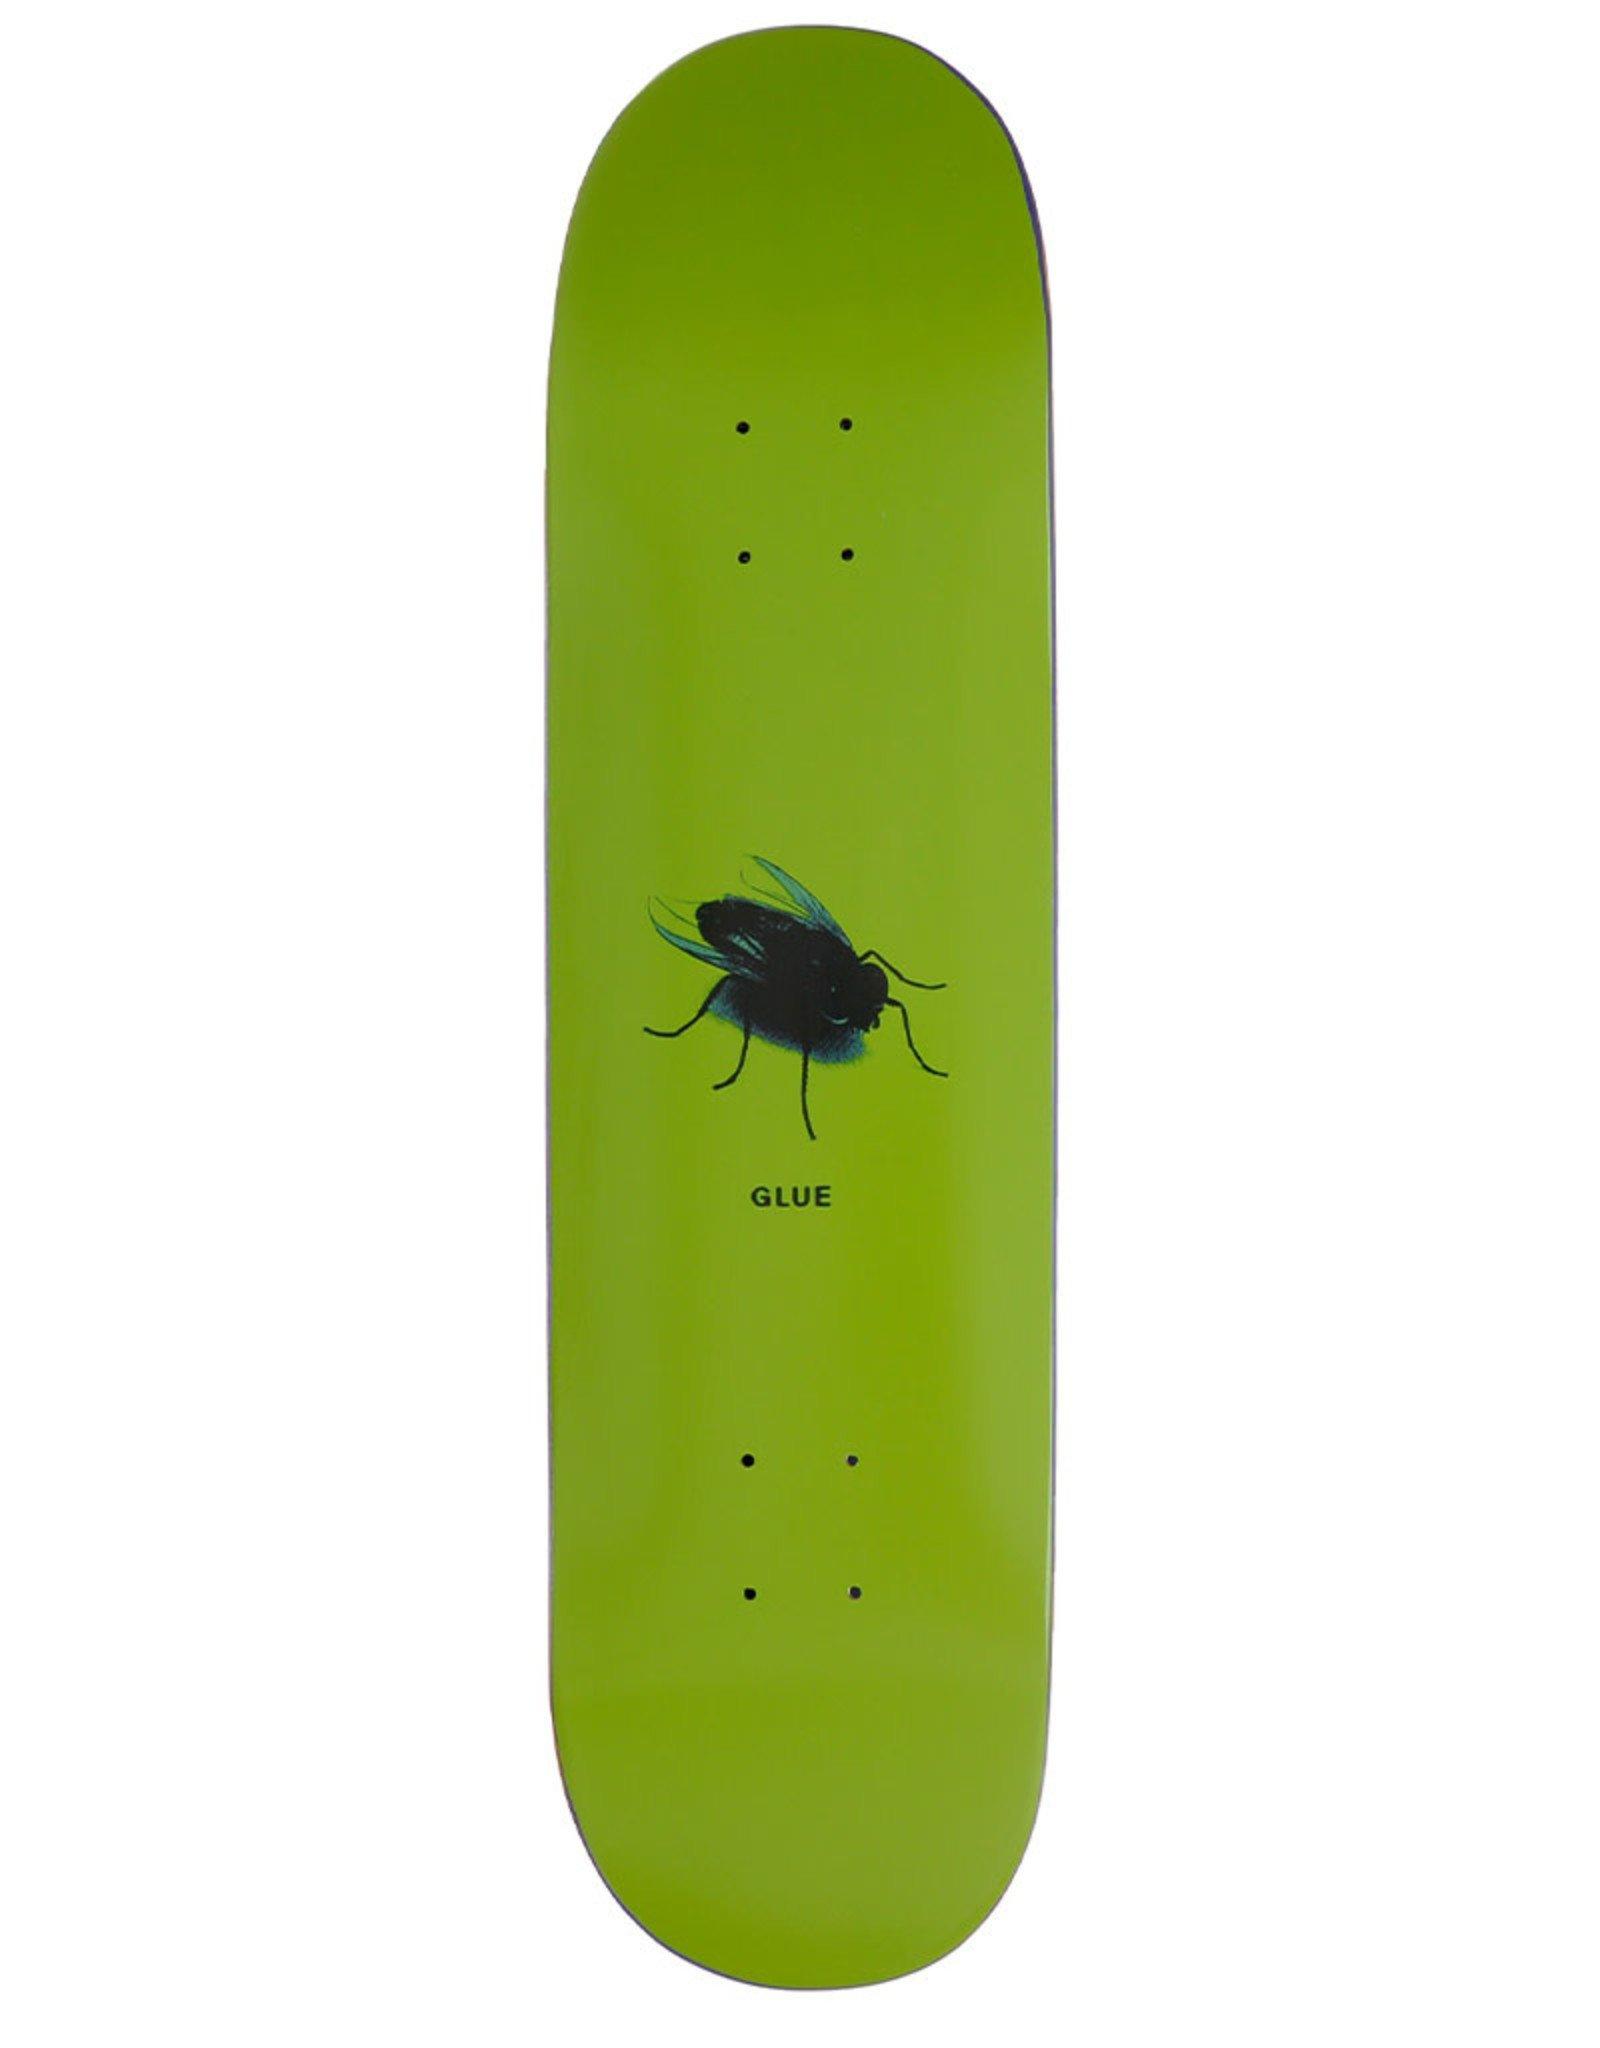 Glue Skateboards Glue Deck Team Fly Green (8.25)